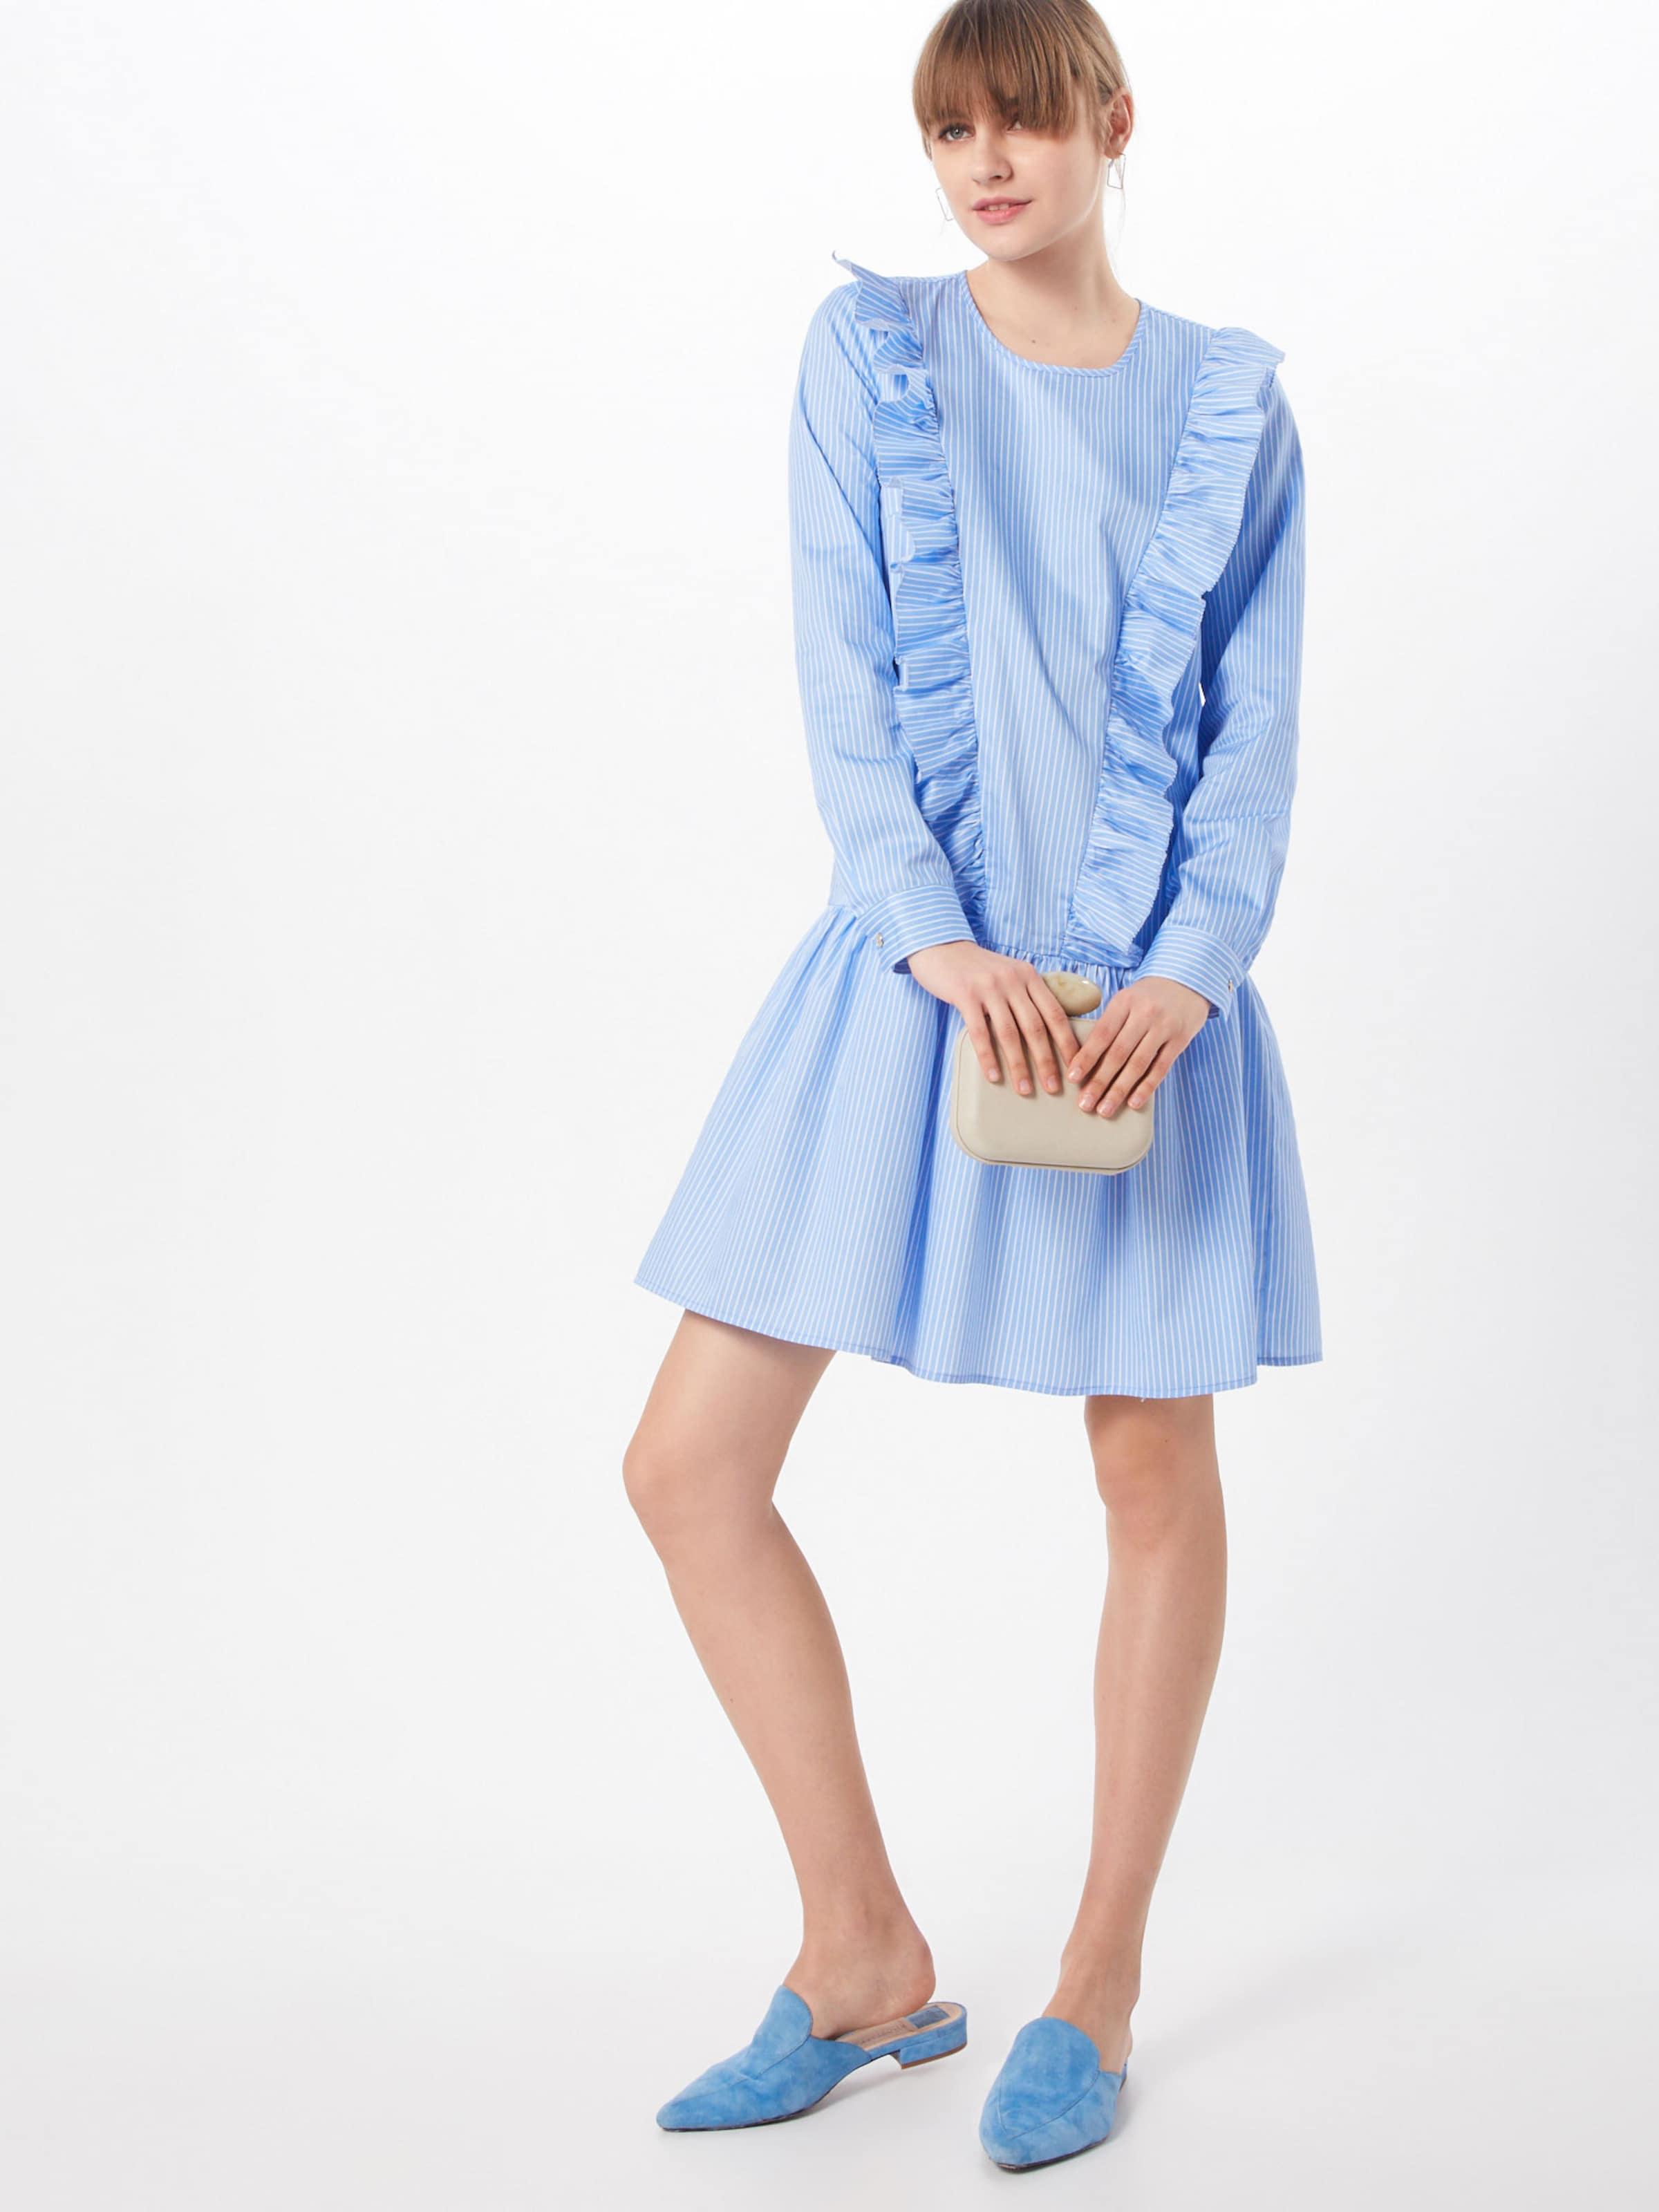 Sofie 's191256' D'été En Robe Schnoor Bleu Rj5A4L